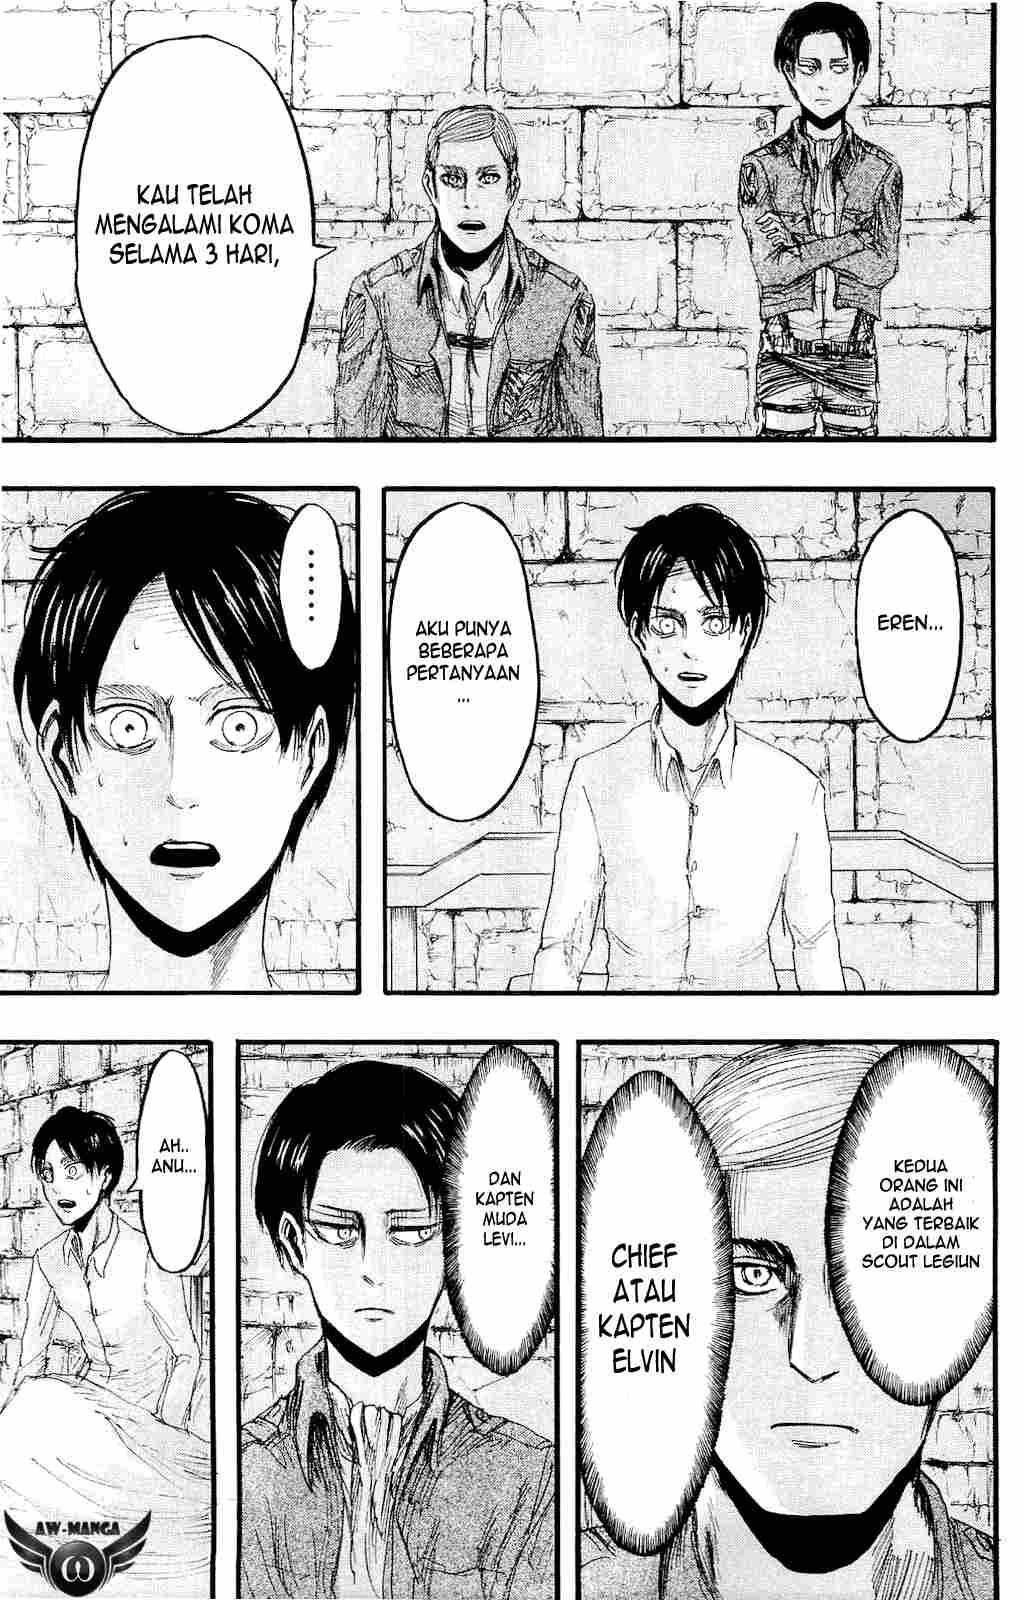 Komik shingeki no kyojin 018 - sekarang apa yang harus dilakukan 19 Indonesia shingeki no kyojin 018 - sekarang apa yang harus dilakukan Terbaru 34|Baca Manga Komik Indonesia|